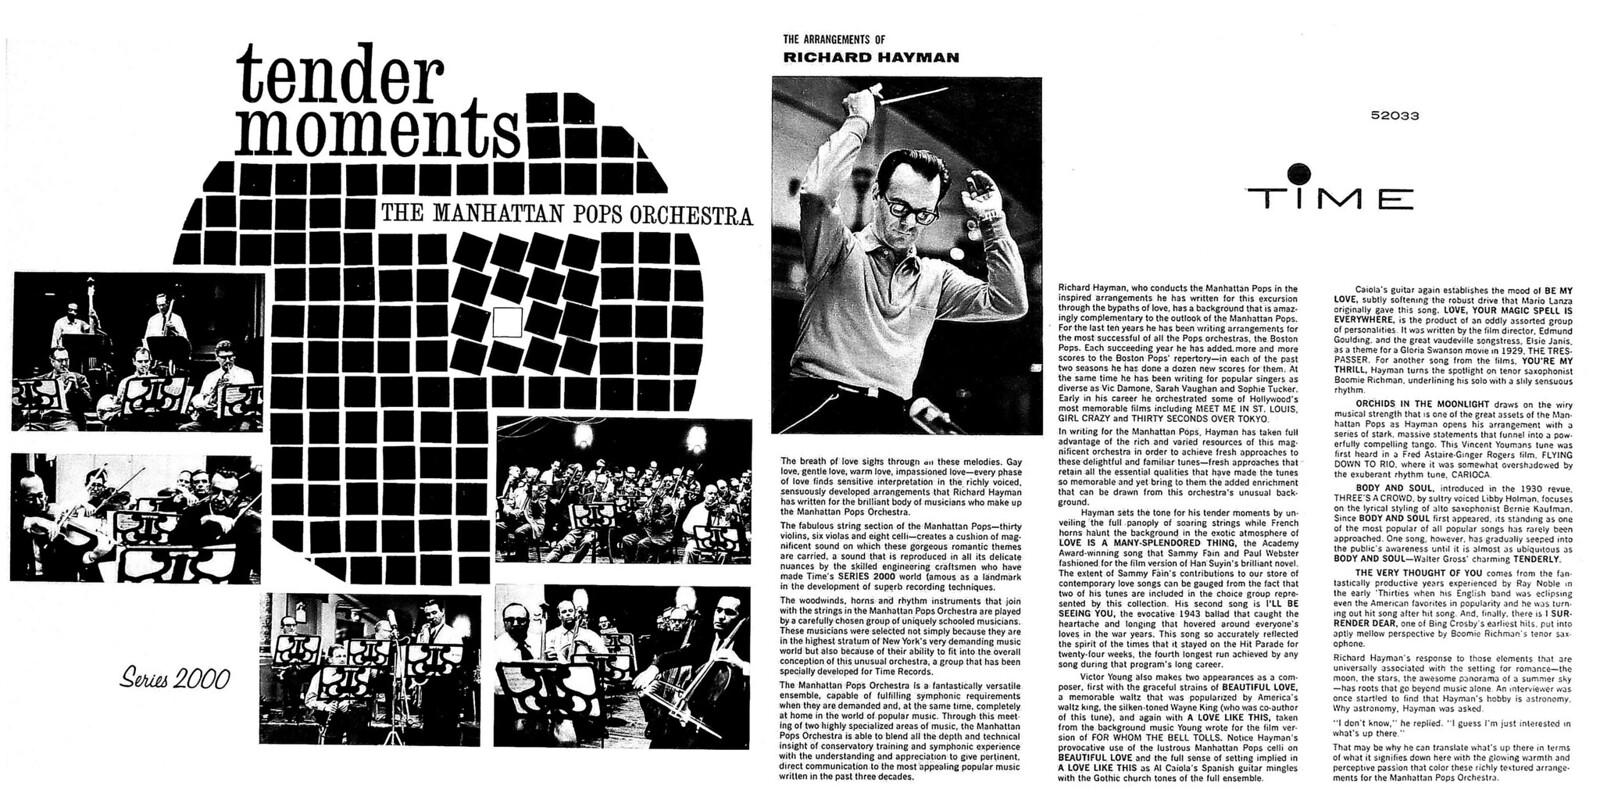 Richard Hayman - Tender Moments